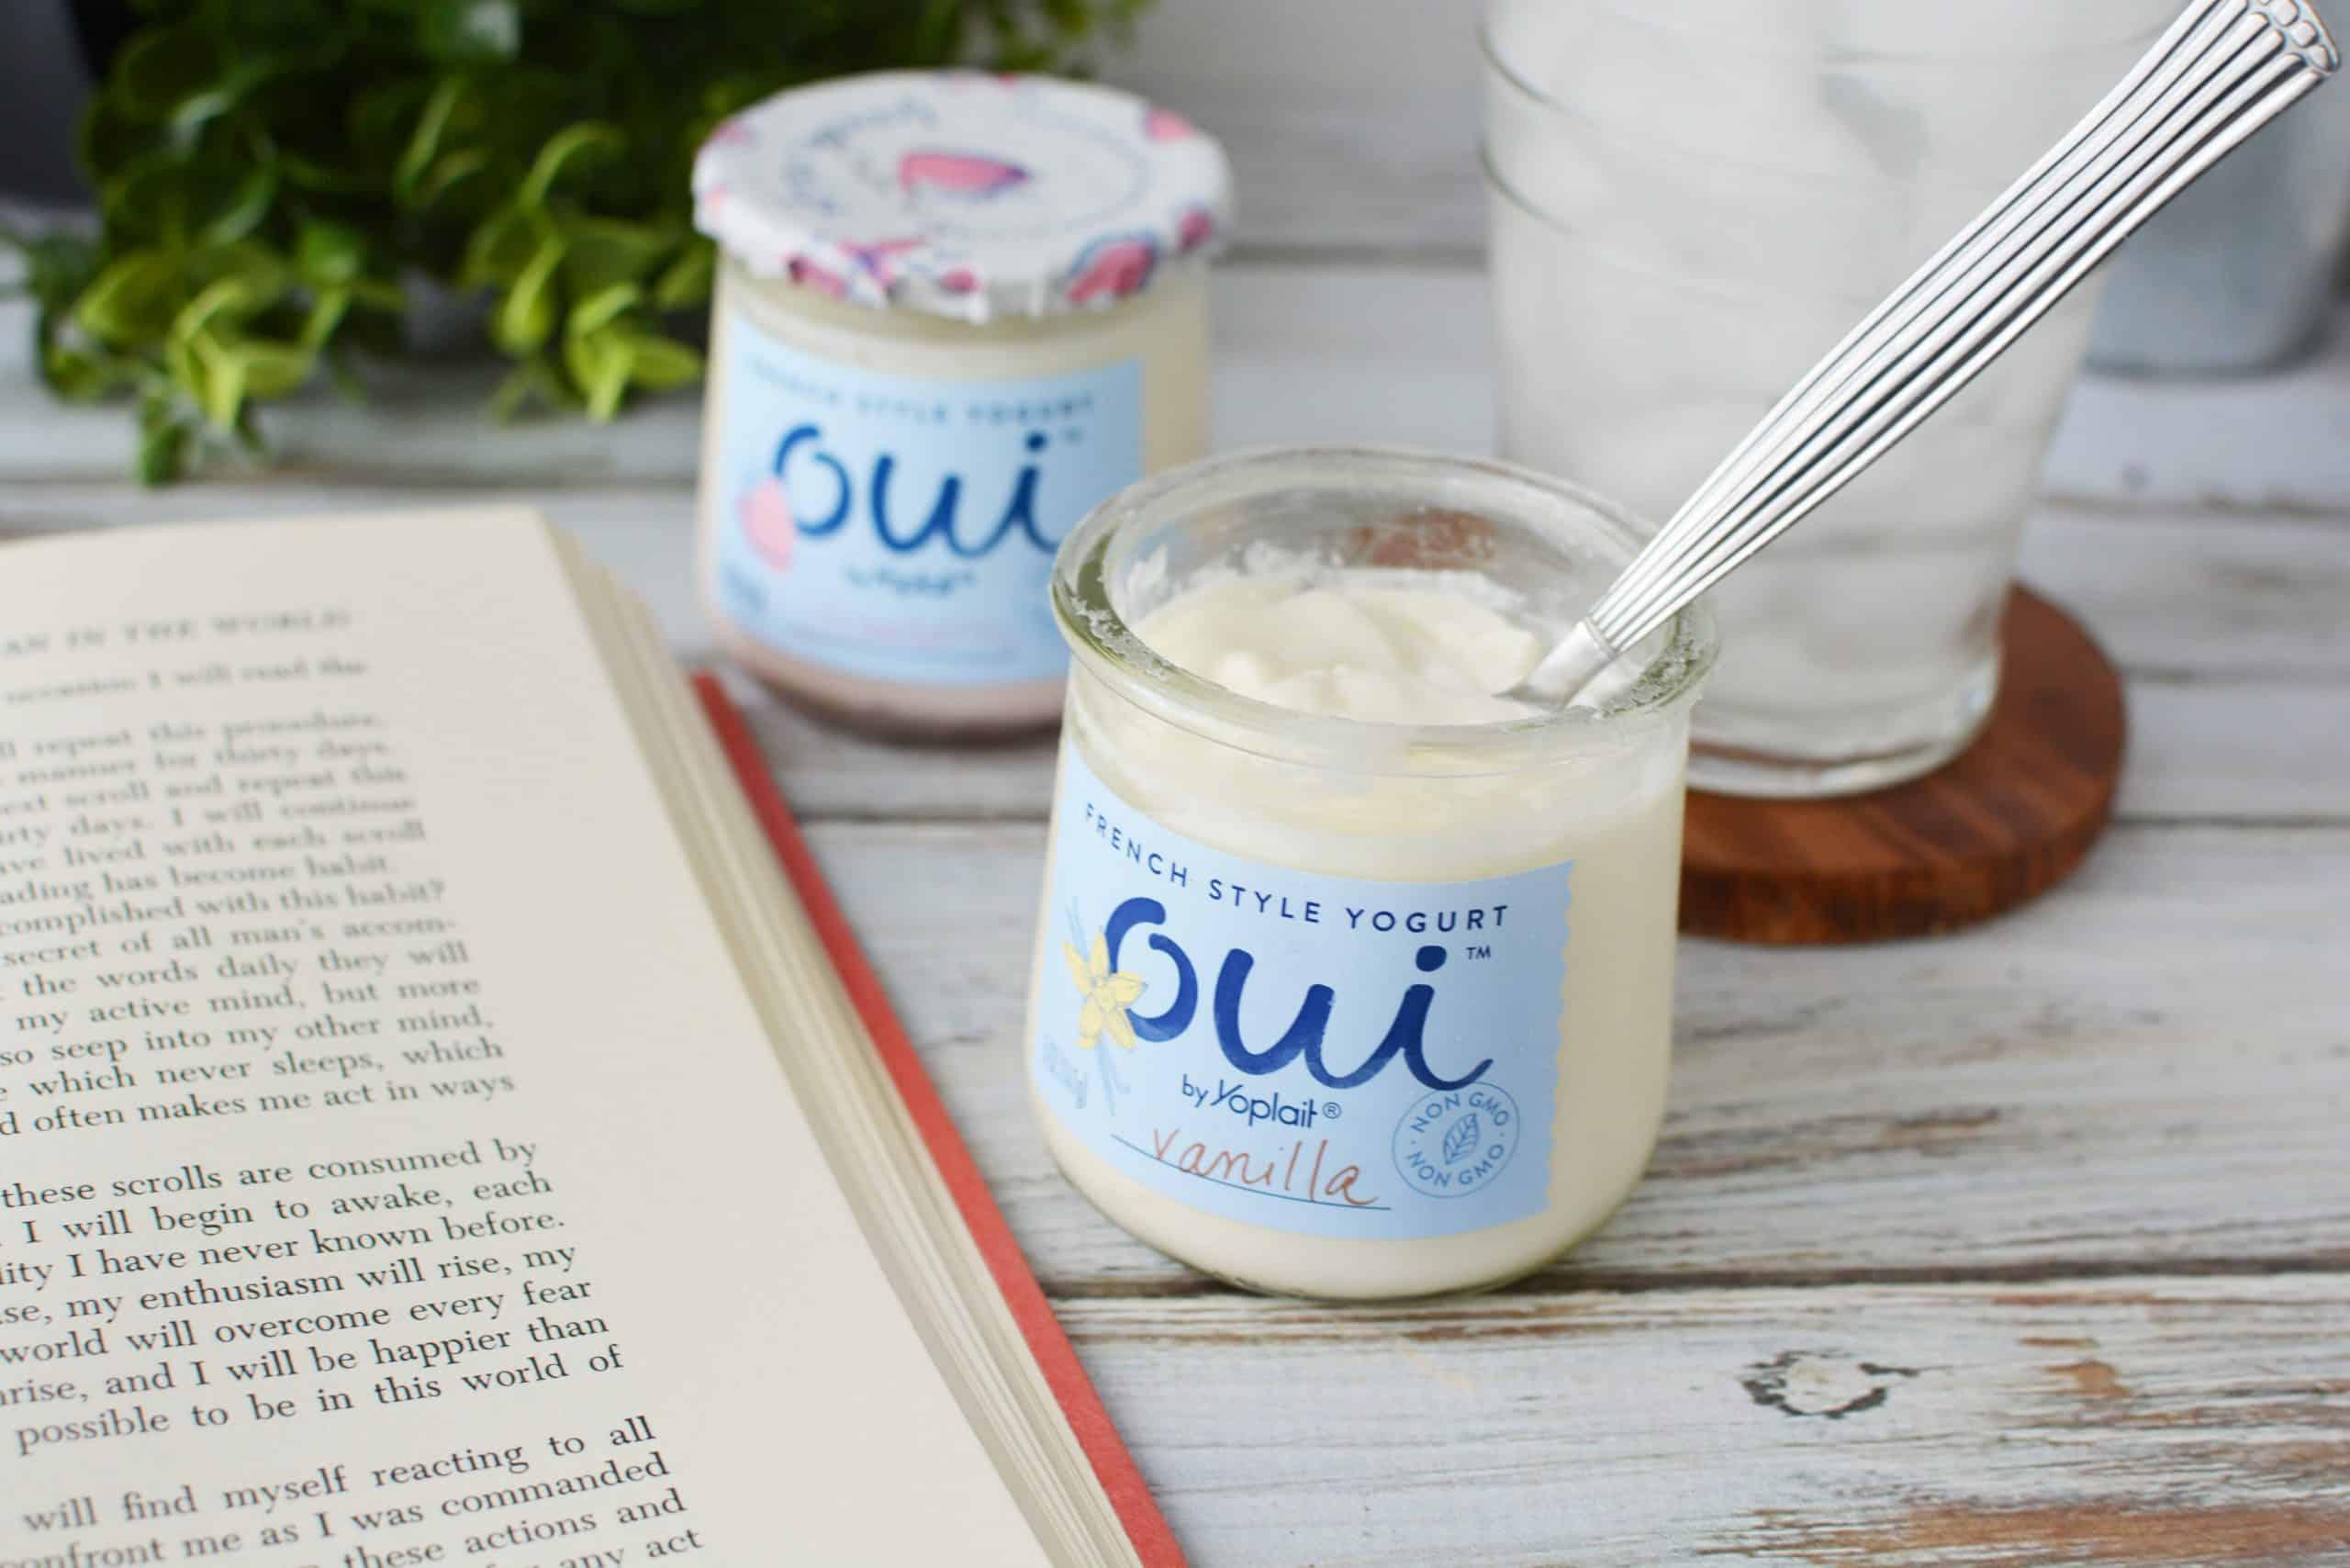 Me-Time with yoplait Oui yogurt